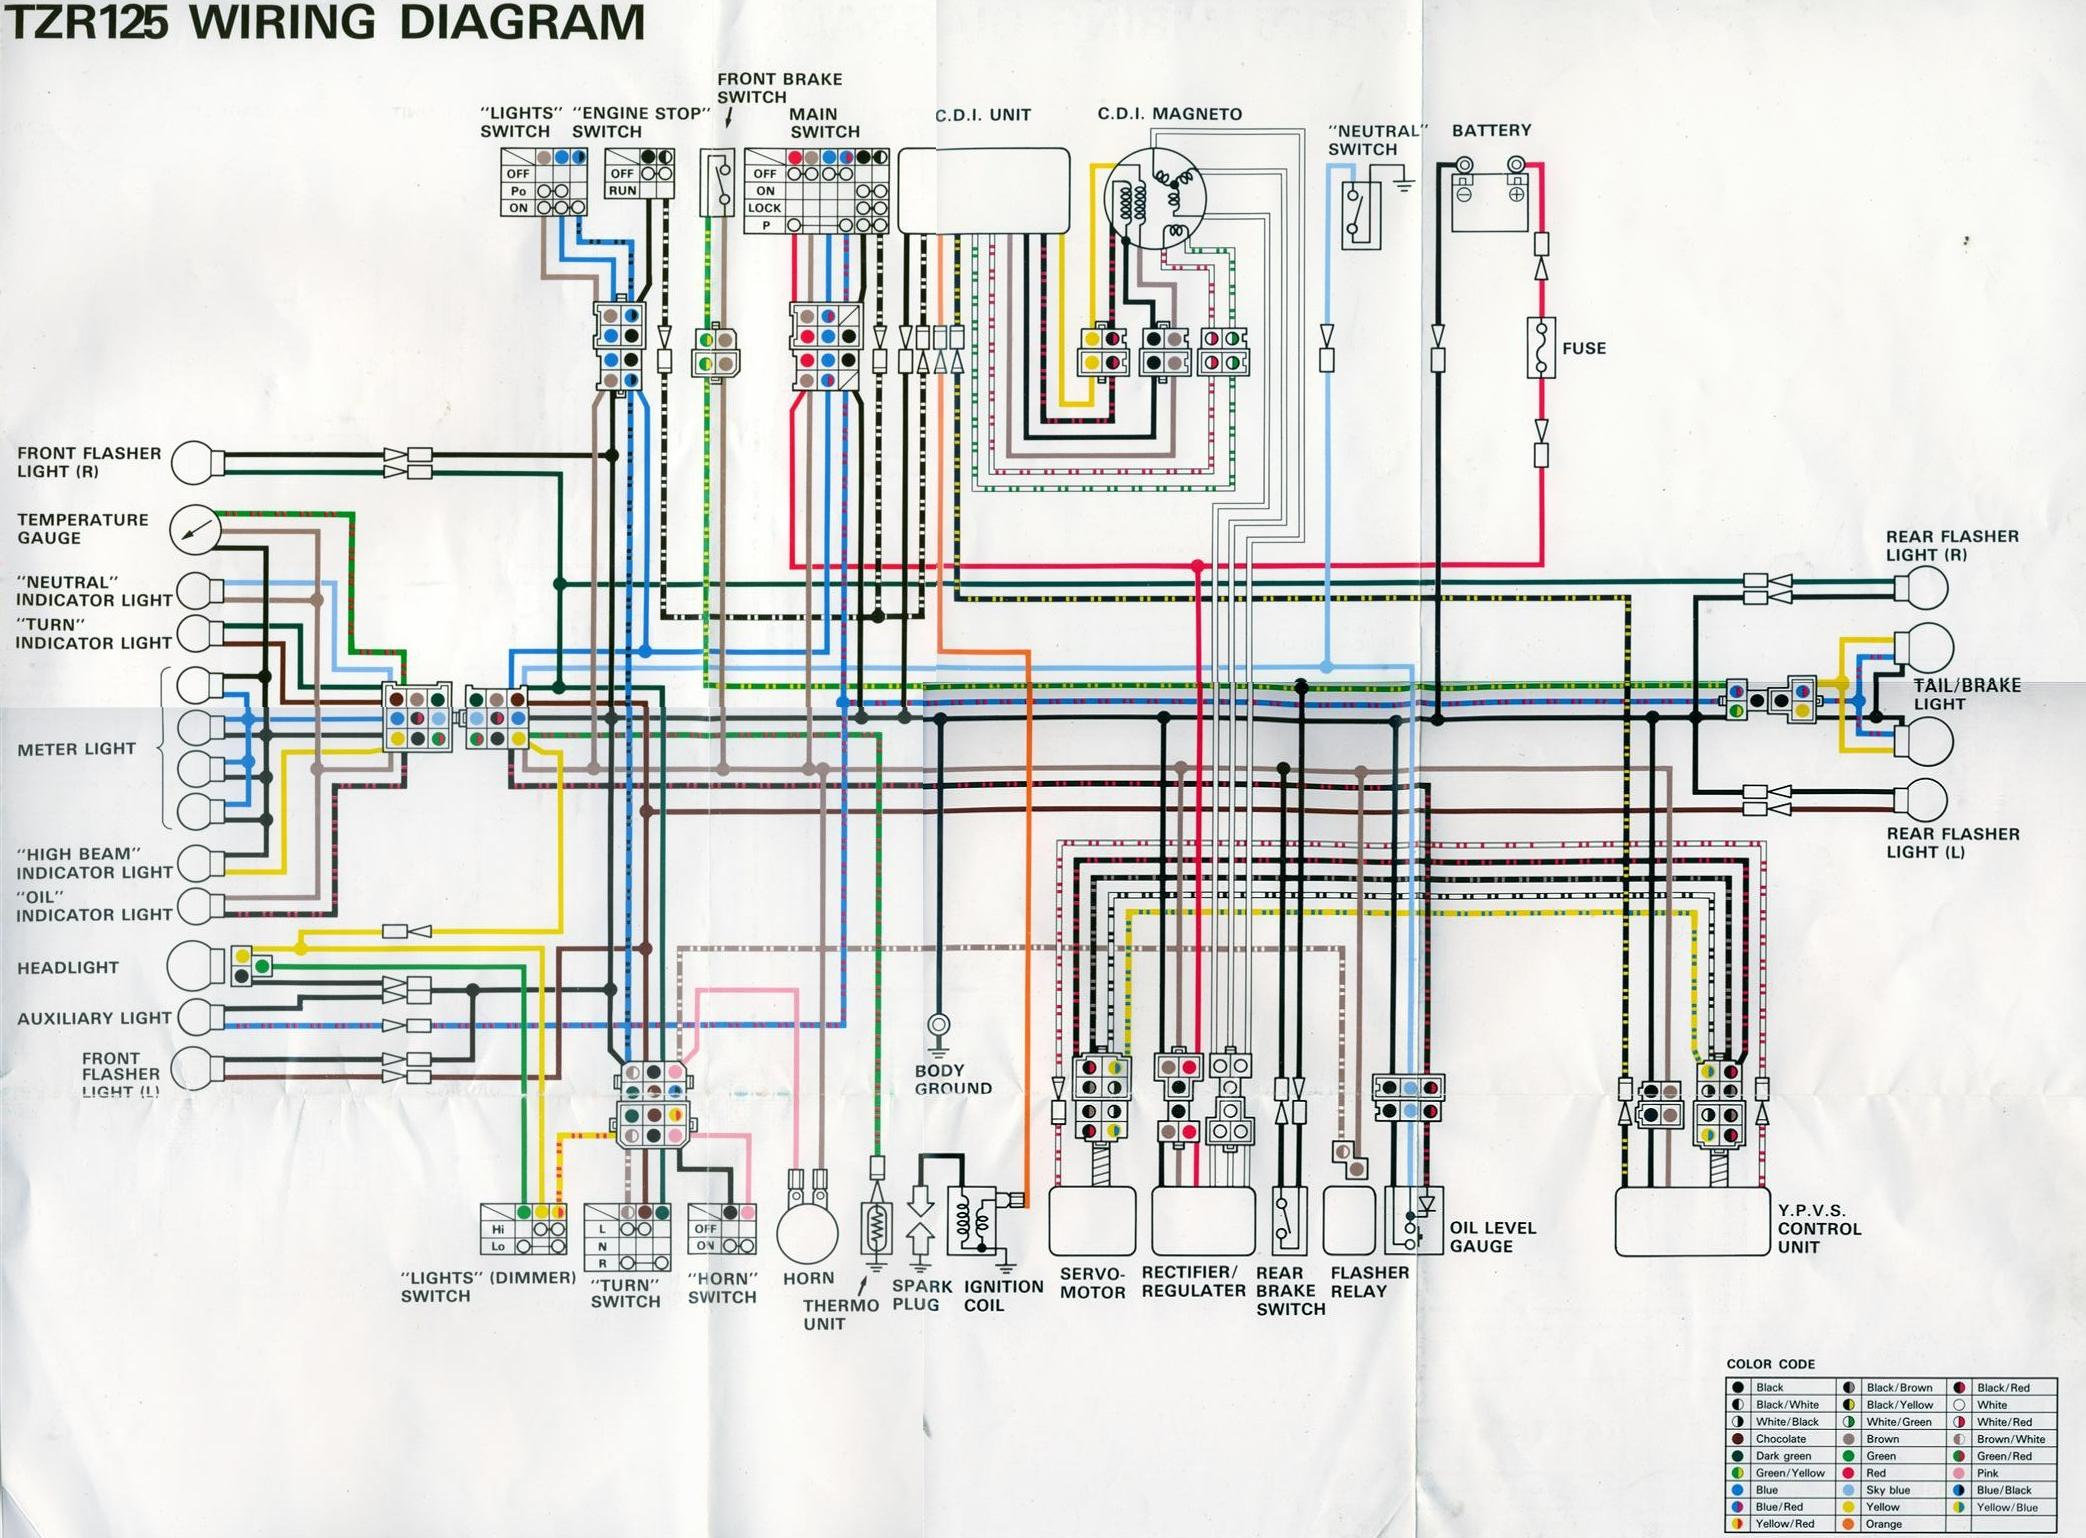 TR_9729] Wiring Diagram Yamaha Tzr 50 Download DiagramTeria Norab Nnigh Pical Venet Mill Pap Mang Phae Mohammedshrine Librar  Wiring 101